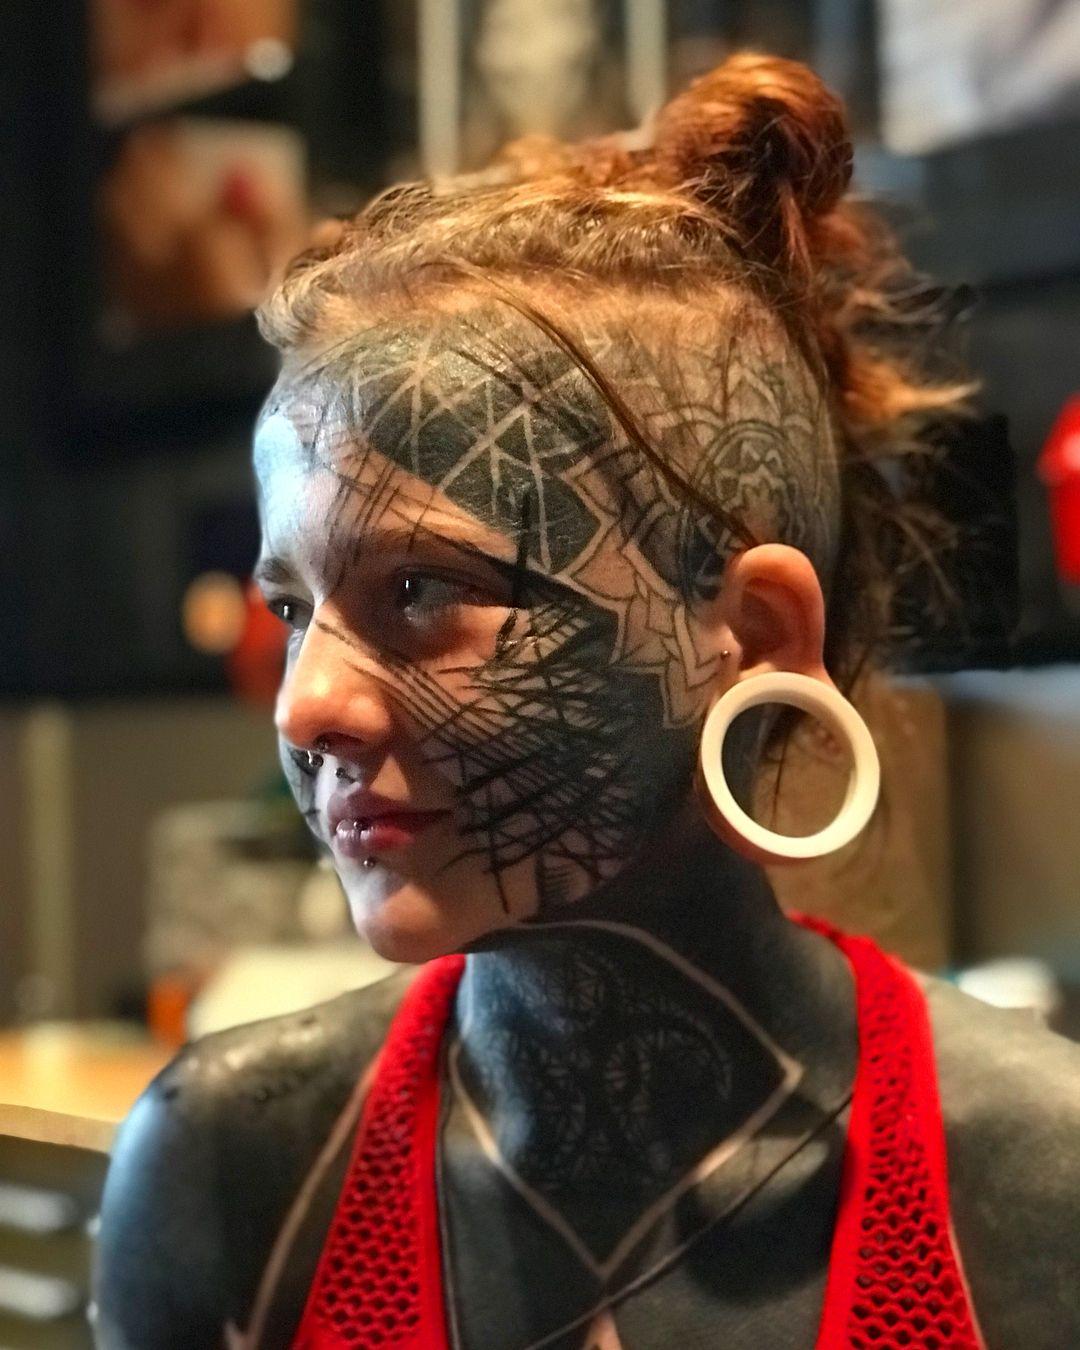 Pin by Todd Hall on tattoos Illustration fashion design